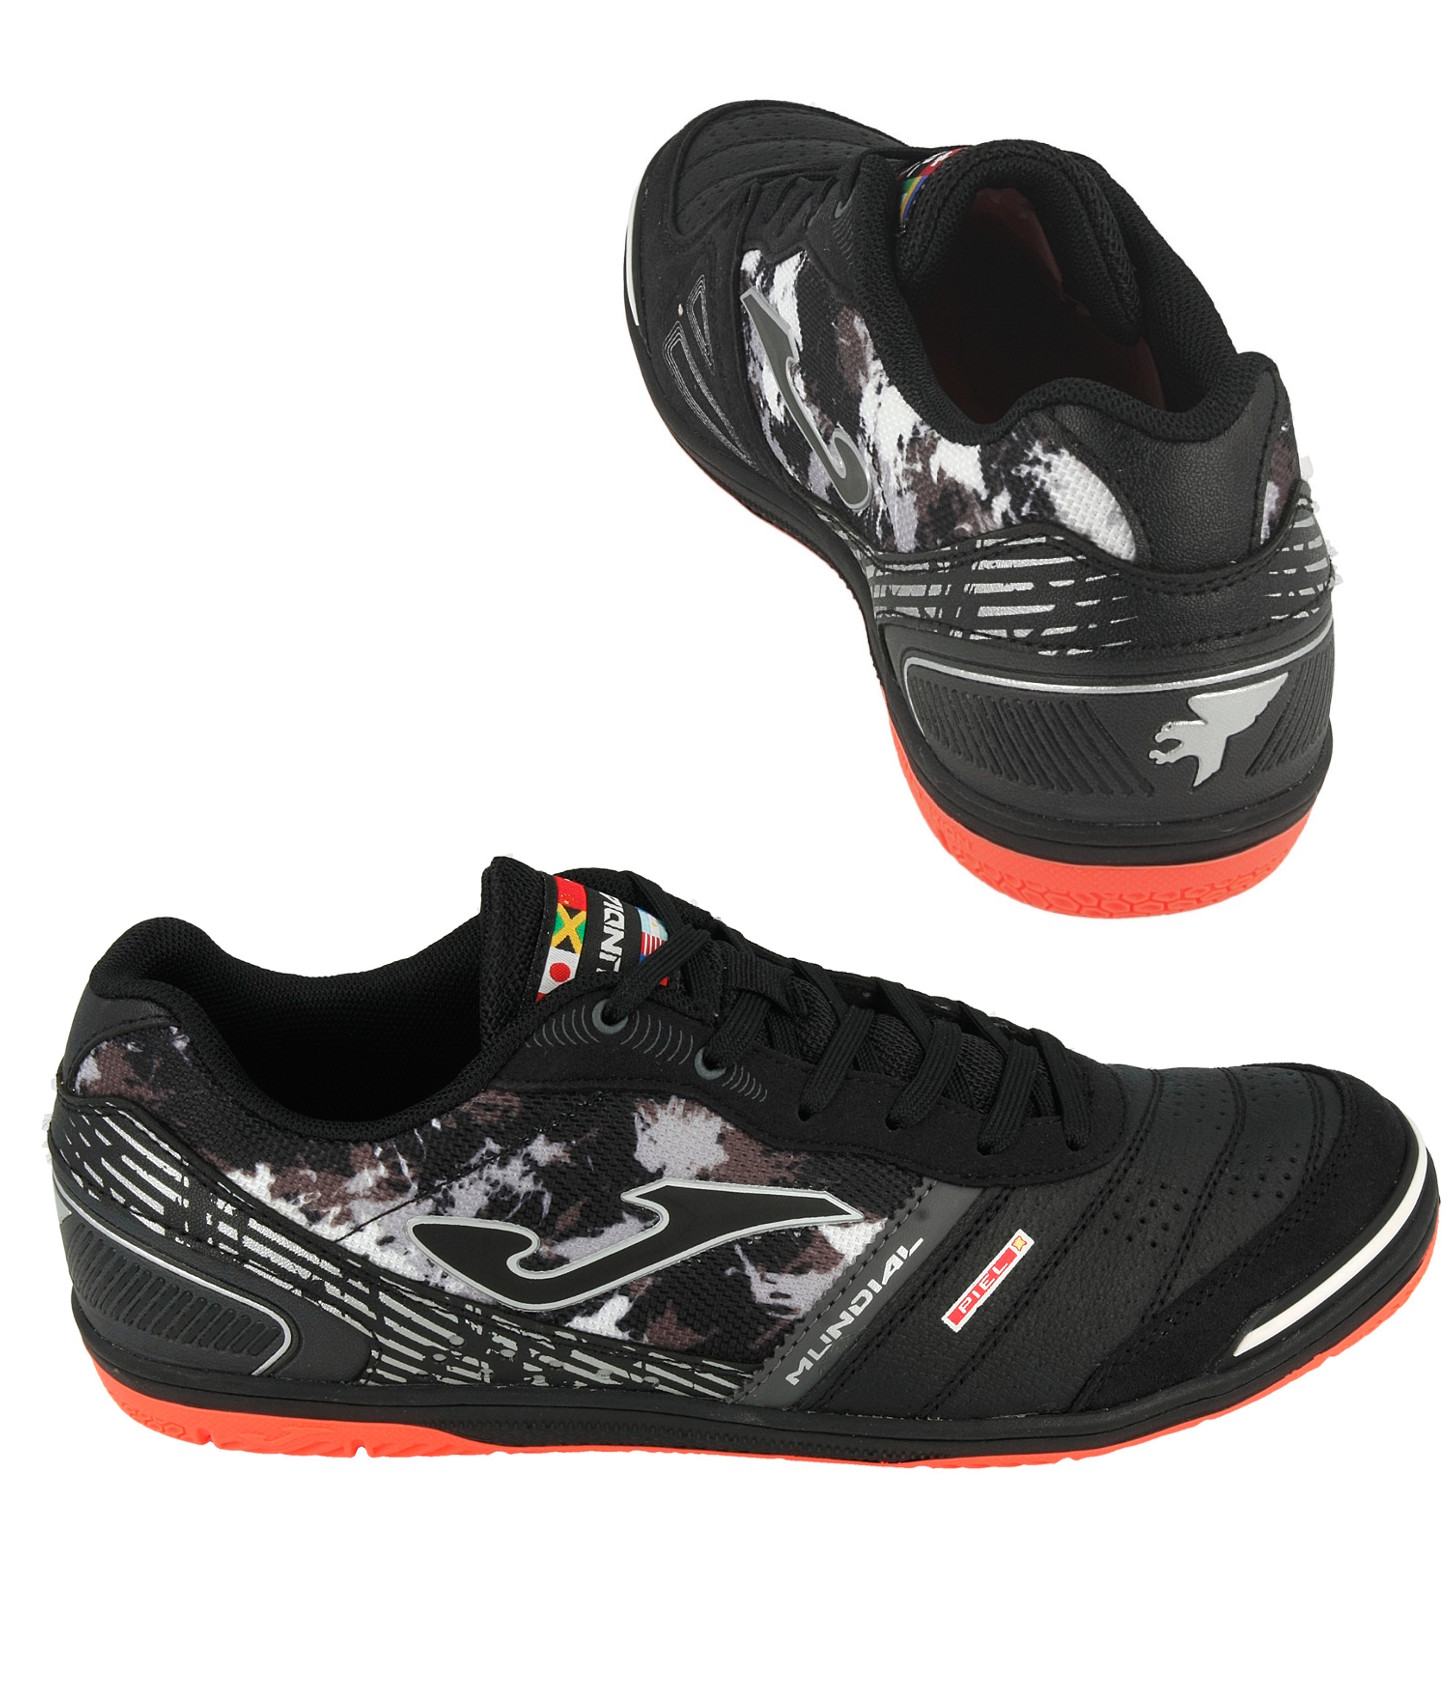 Football shoes Joma Scarpe Calcio Mundial Nero Indoor IC Sala Futsal parquet